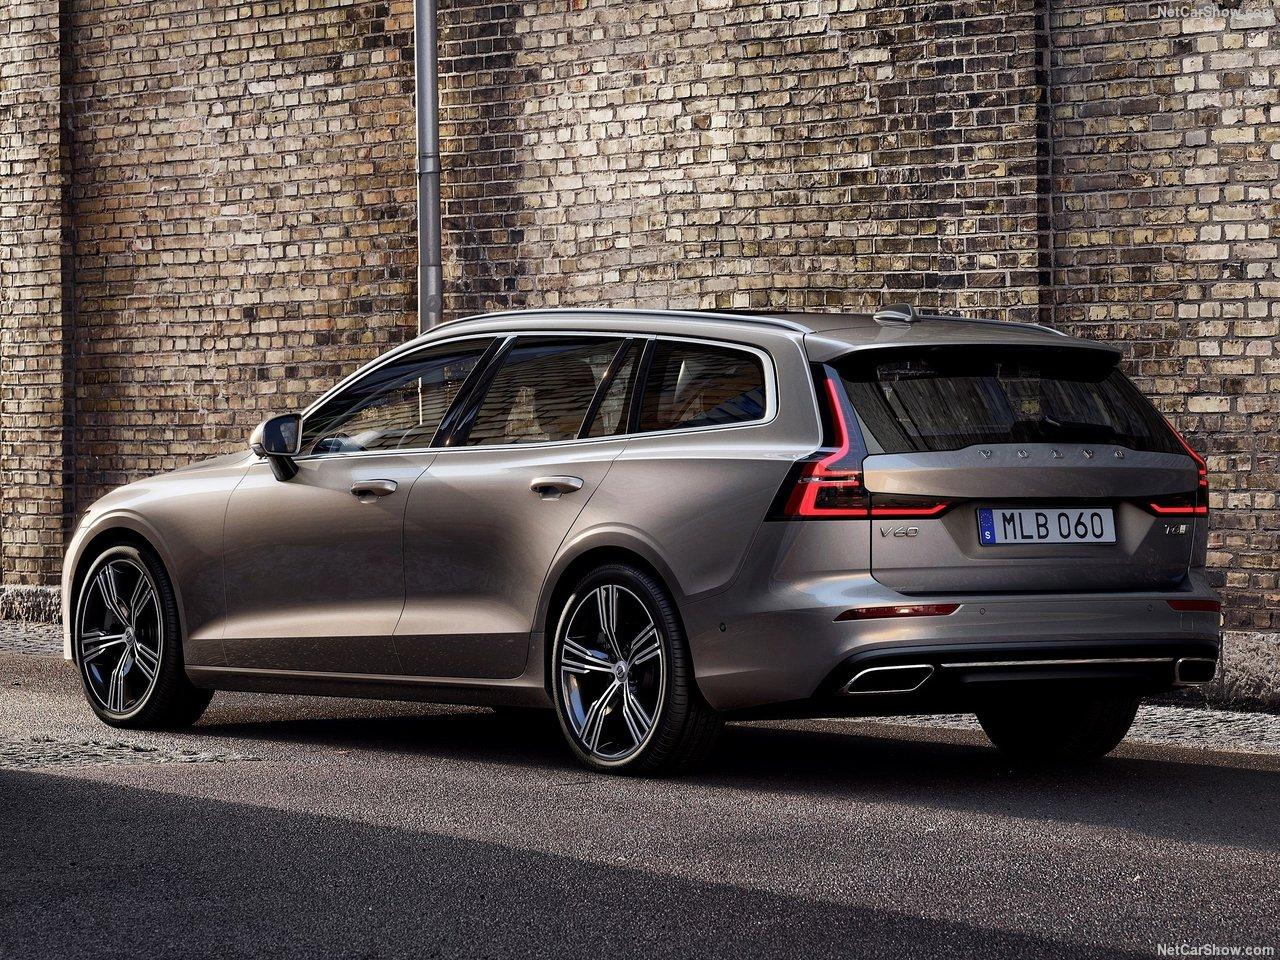 Volvo-V60-2019-1280-4d.jpg